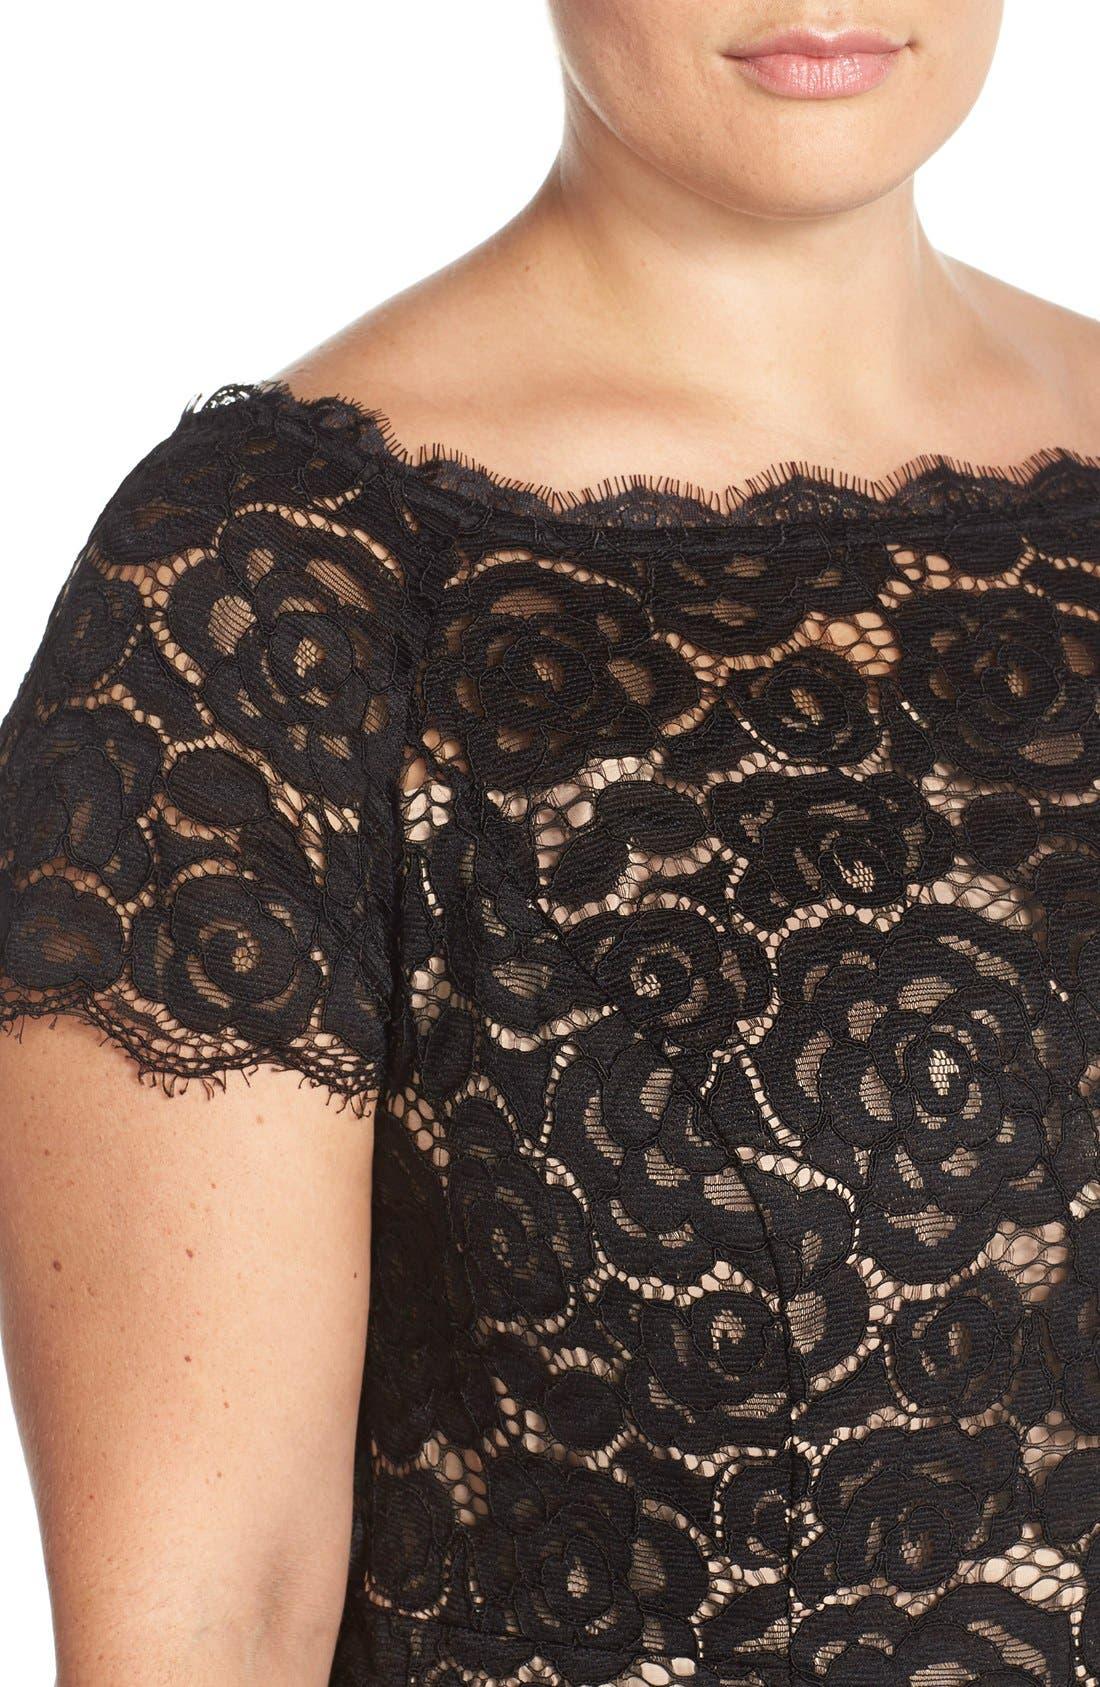 Off the Shoulder Lace Sheath Dress,                             Alternate thumbnail 7, color,                             BLACK/ NUDE